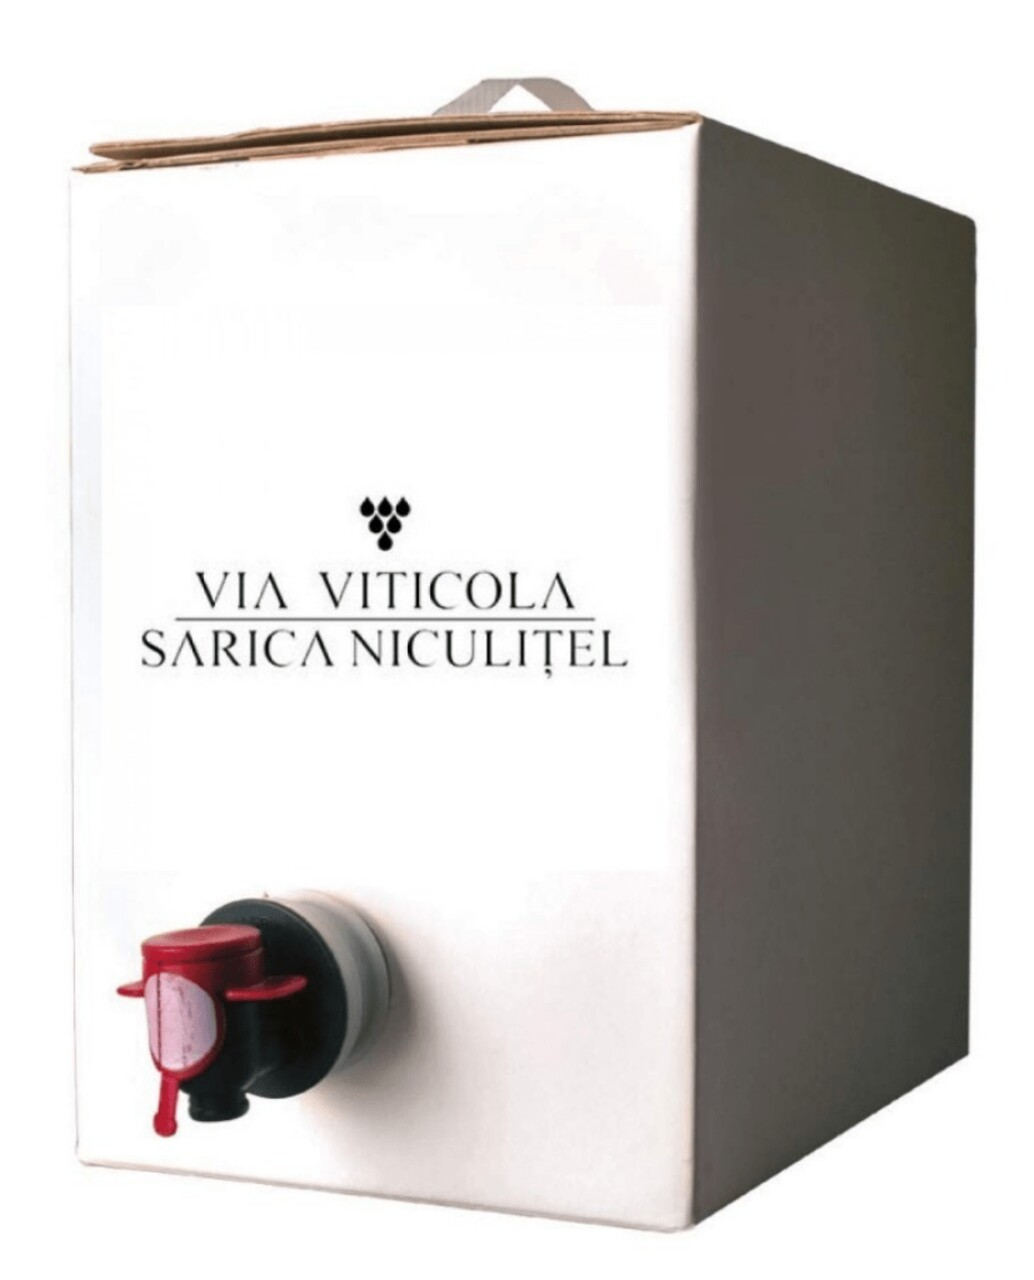 Sarica Niculitel Alb BIB 10L